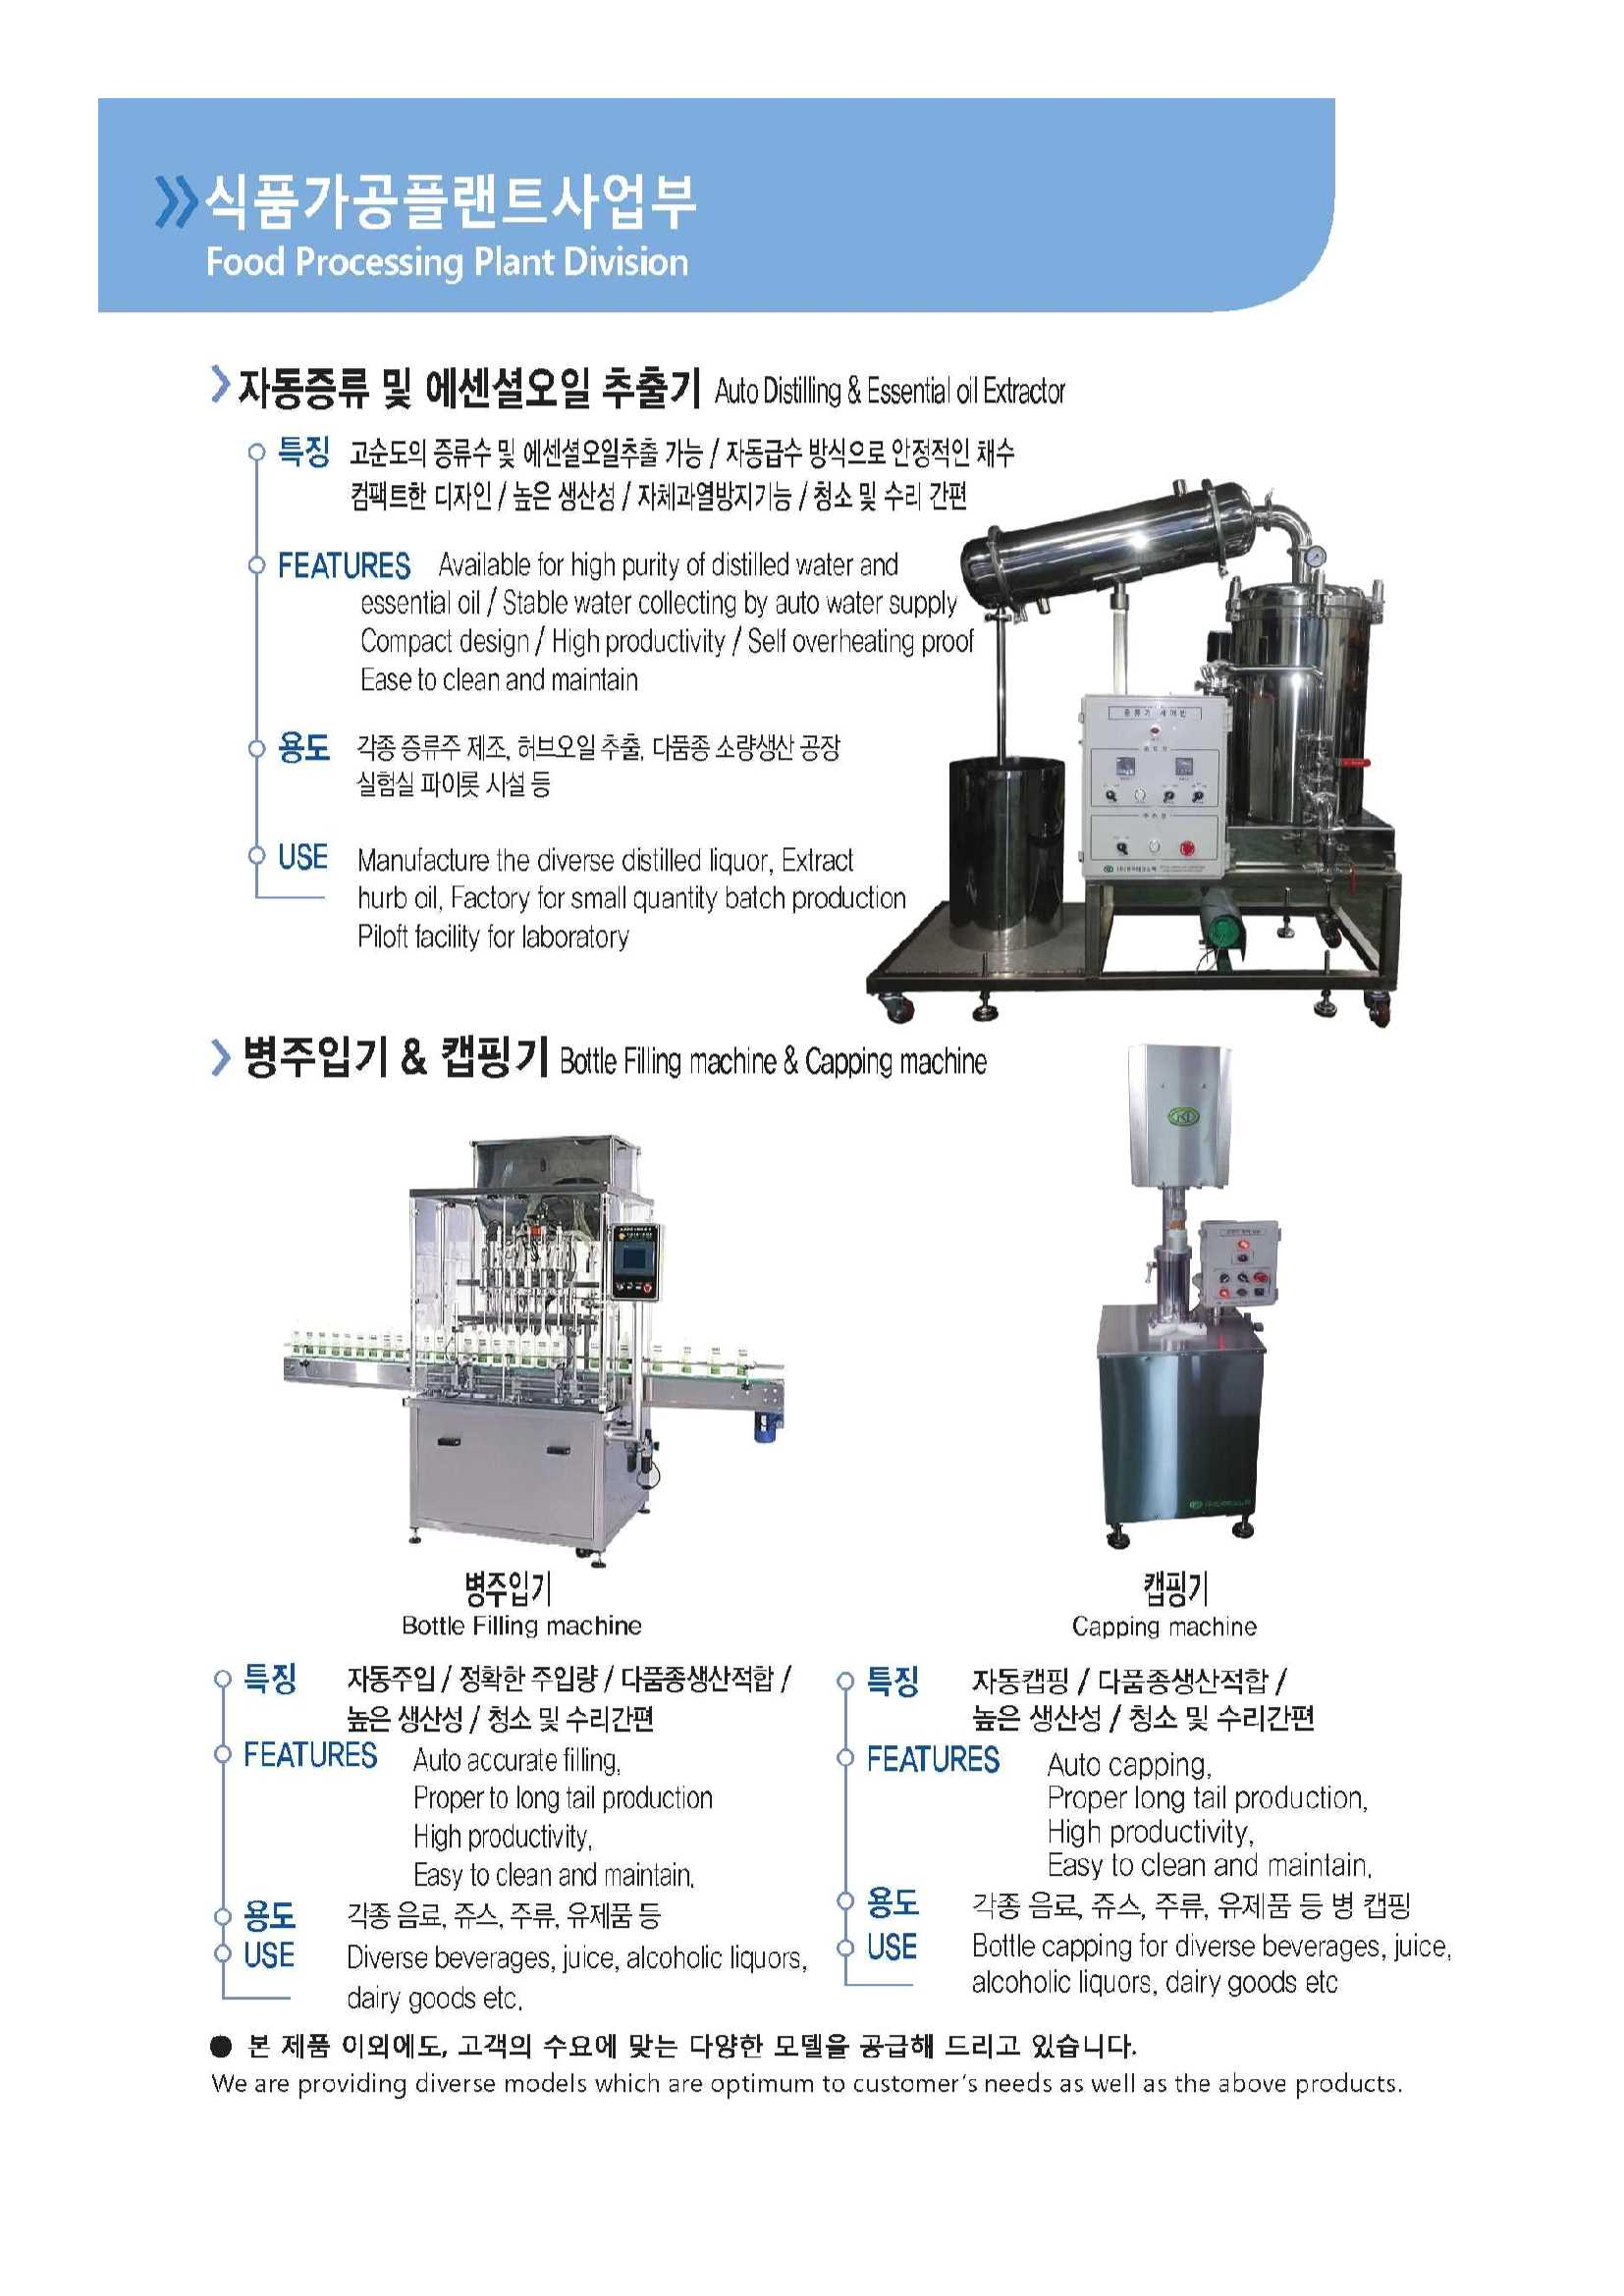 ( Auto Distilling & Essential Oil Extrator, Bottle Filling machine) Food Processing Machi